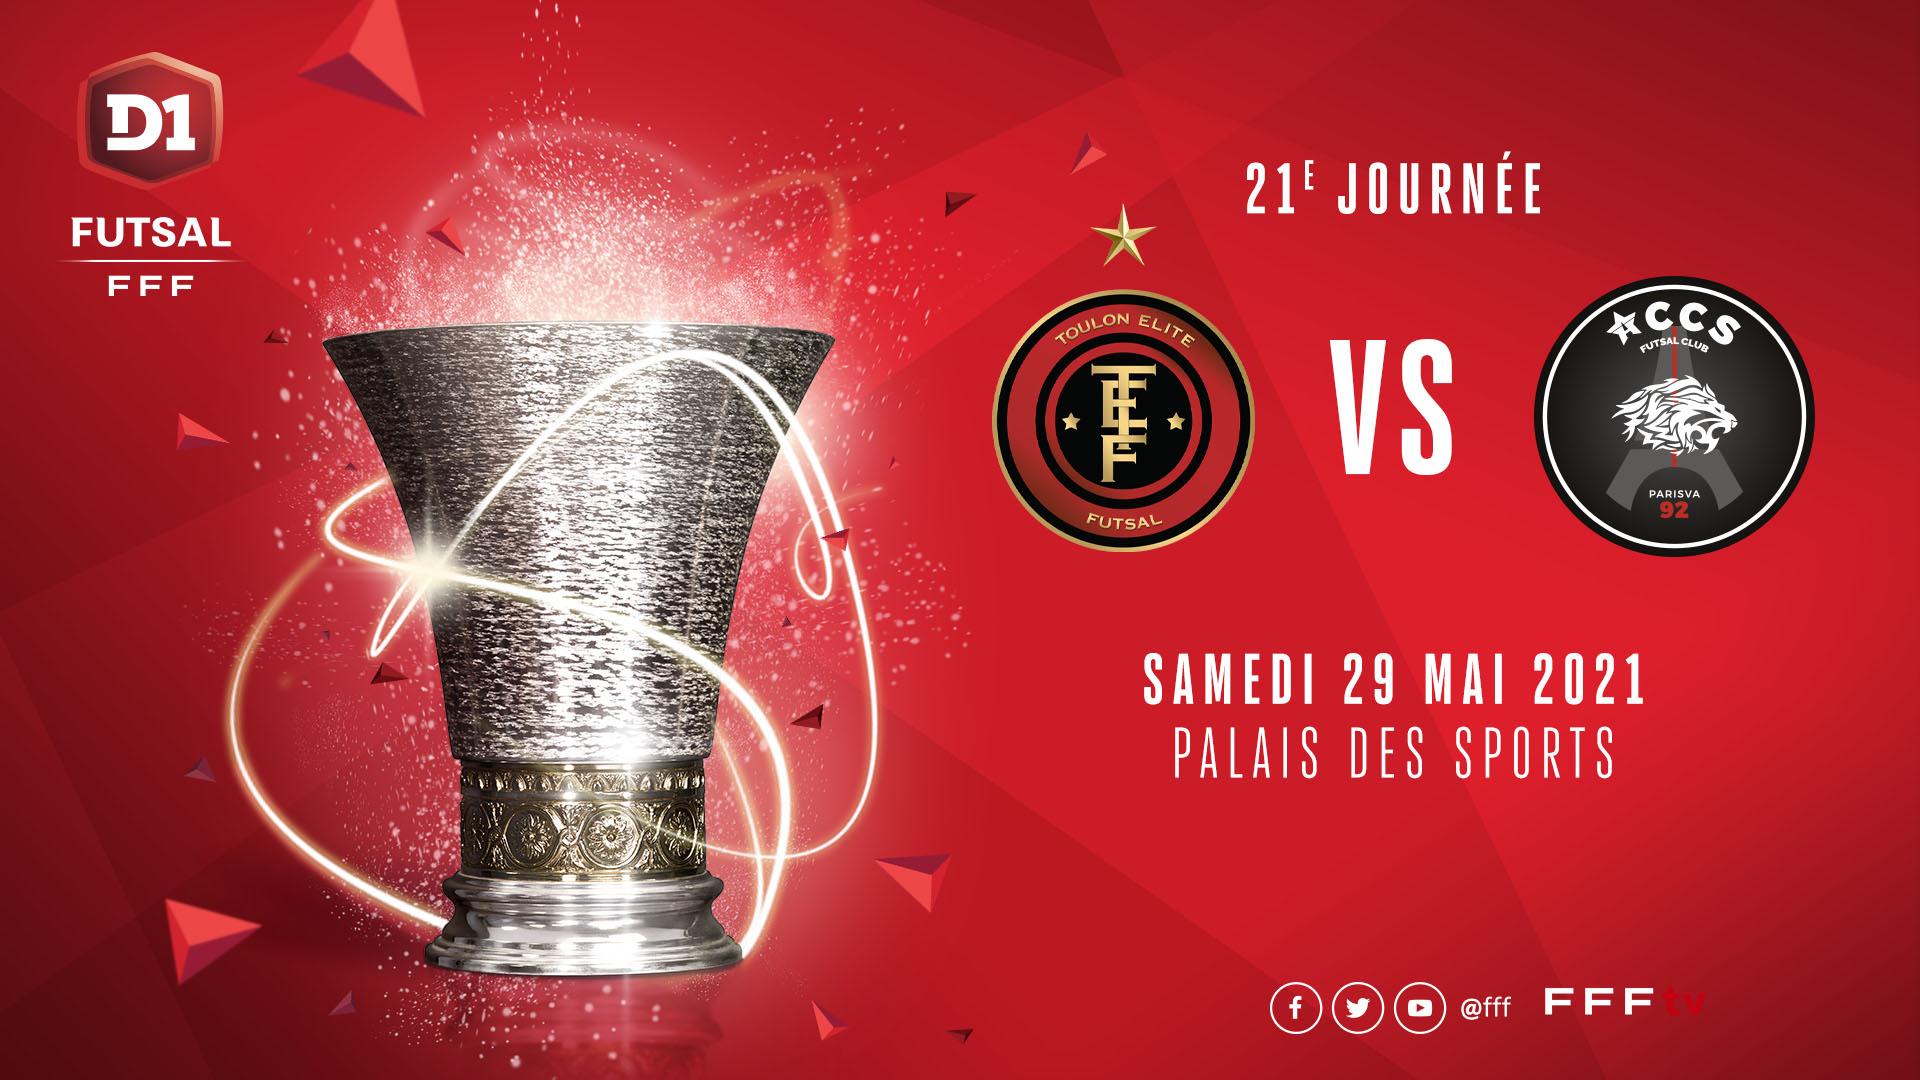 J21 : Toulon EF - ACCS en direct !